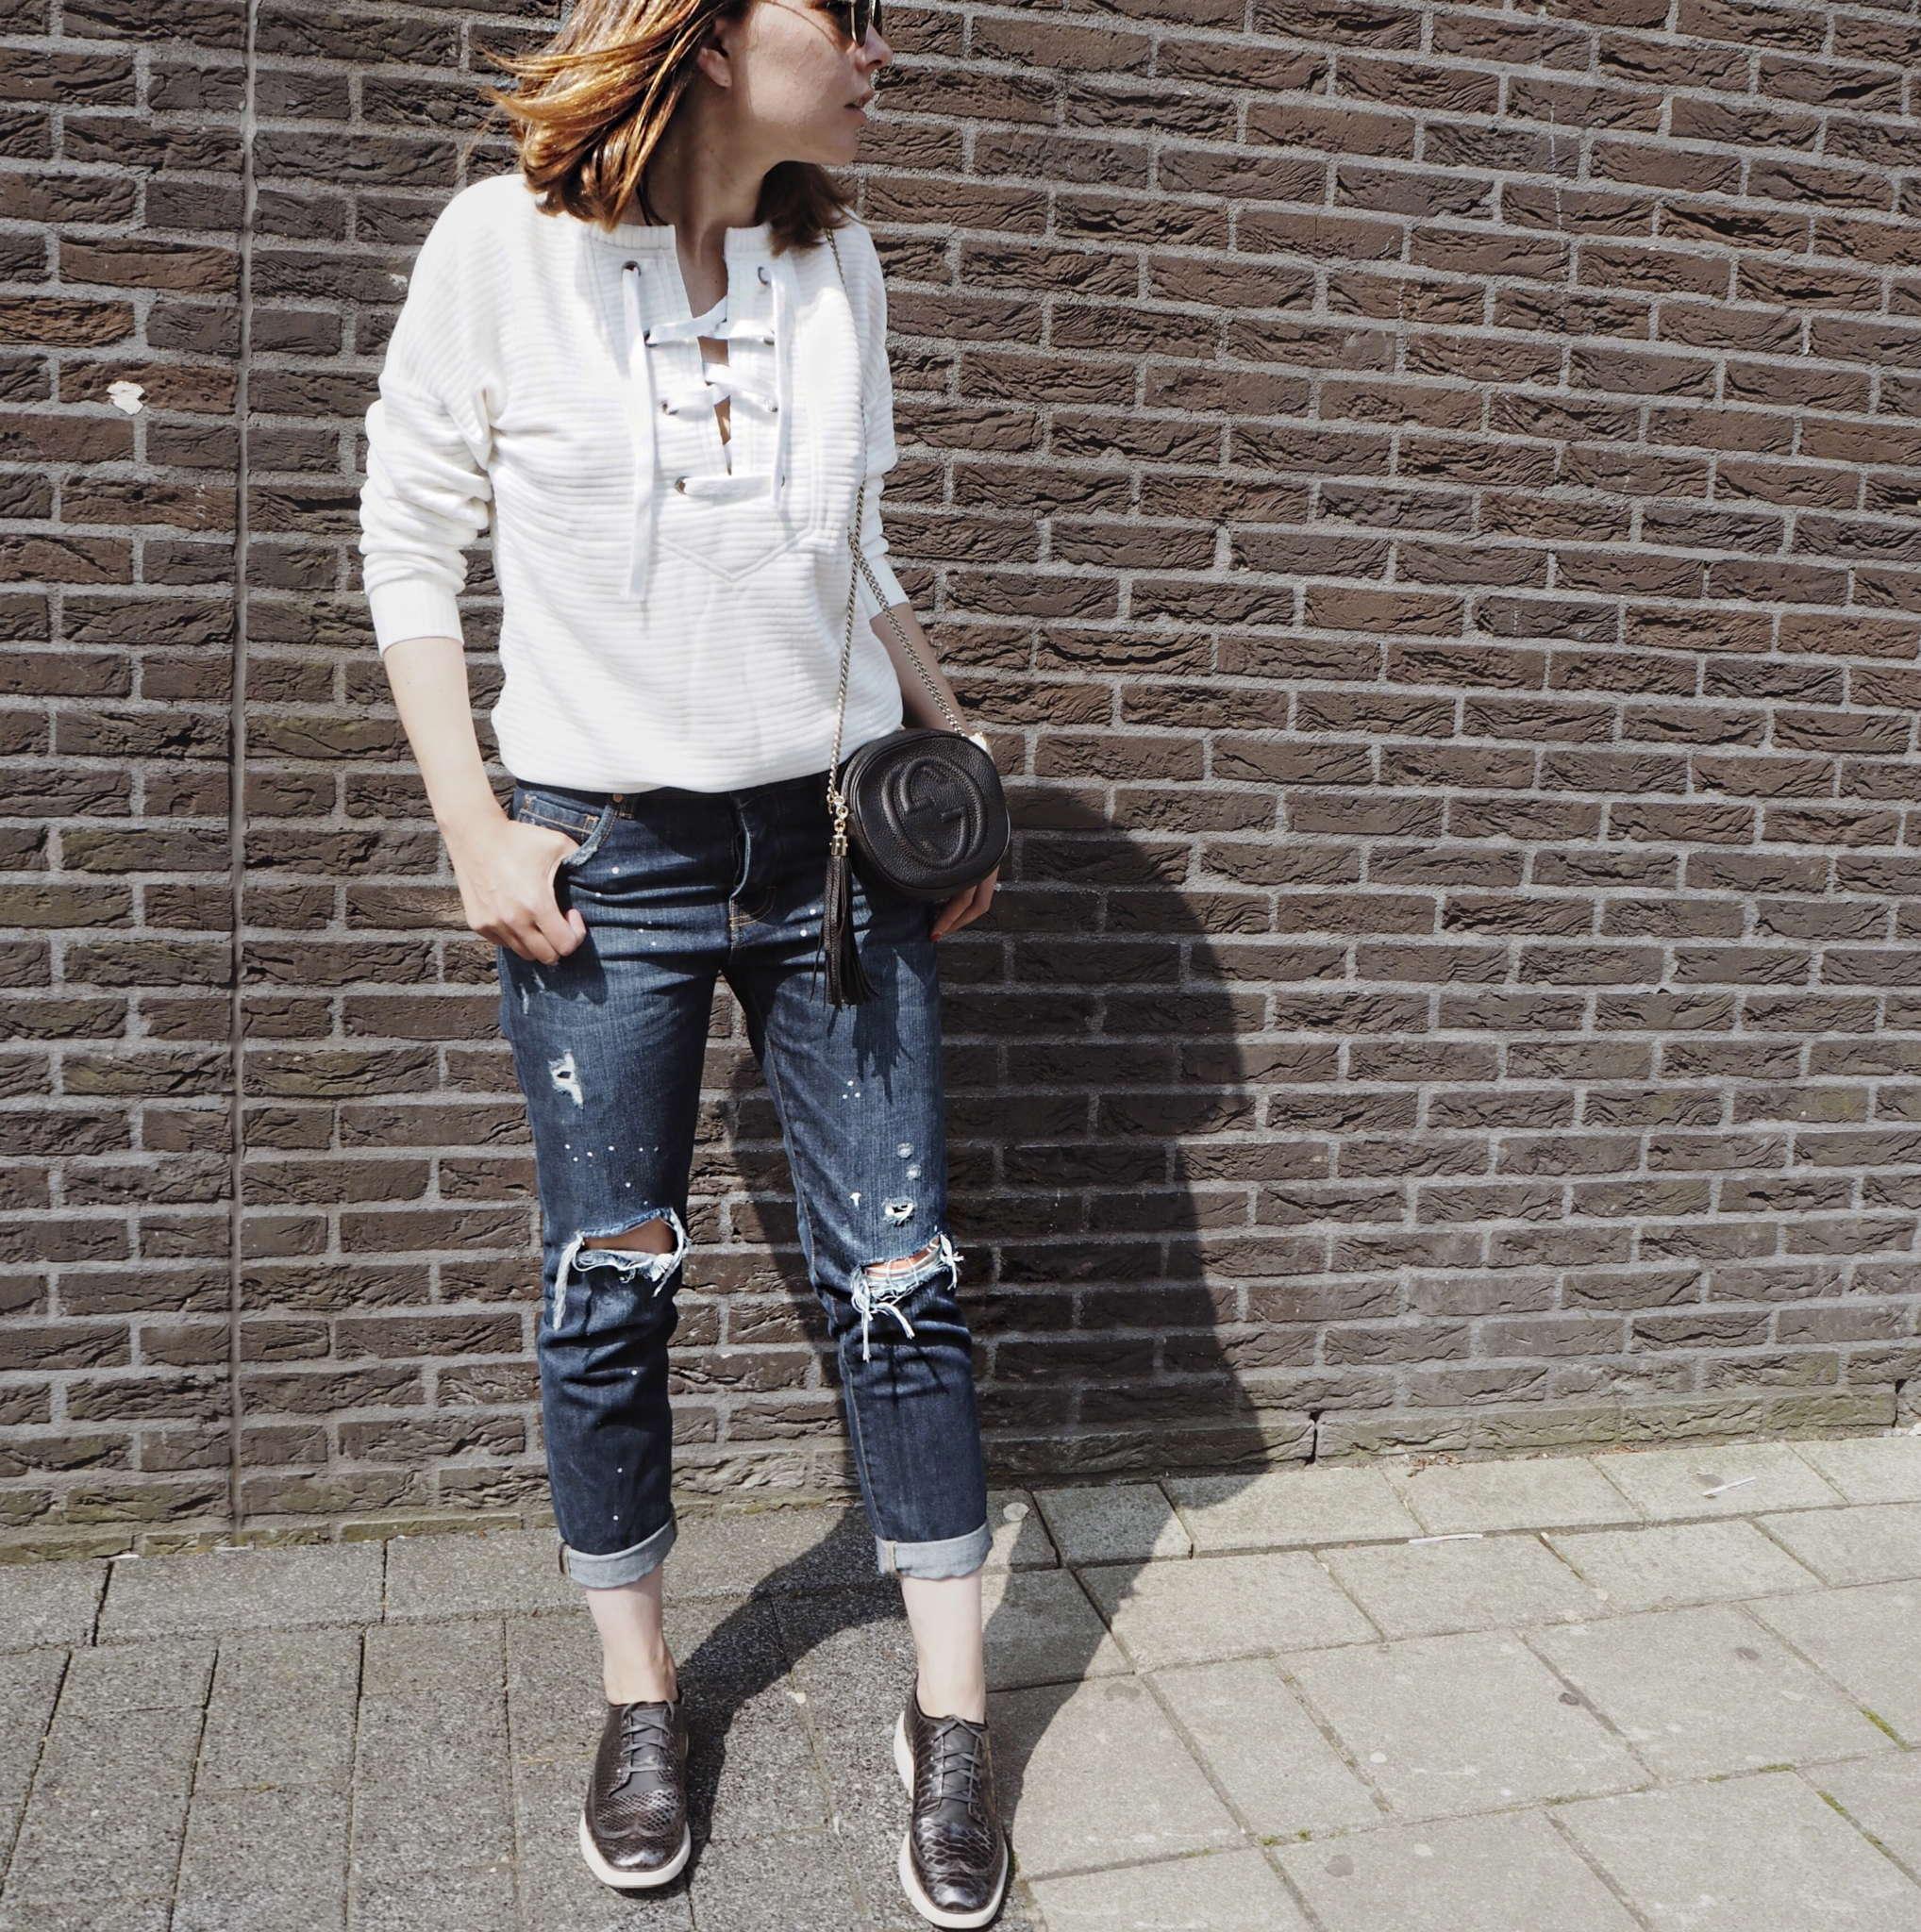 clarks-denim-dricoper-denim-gucci-lace-up-top-ripped-jeans-shein-shoulder-bag